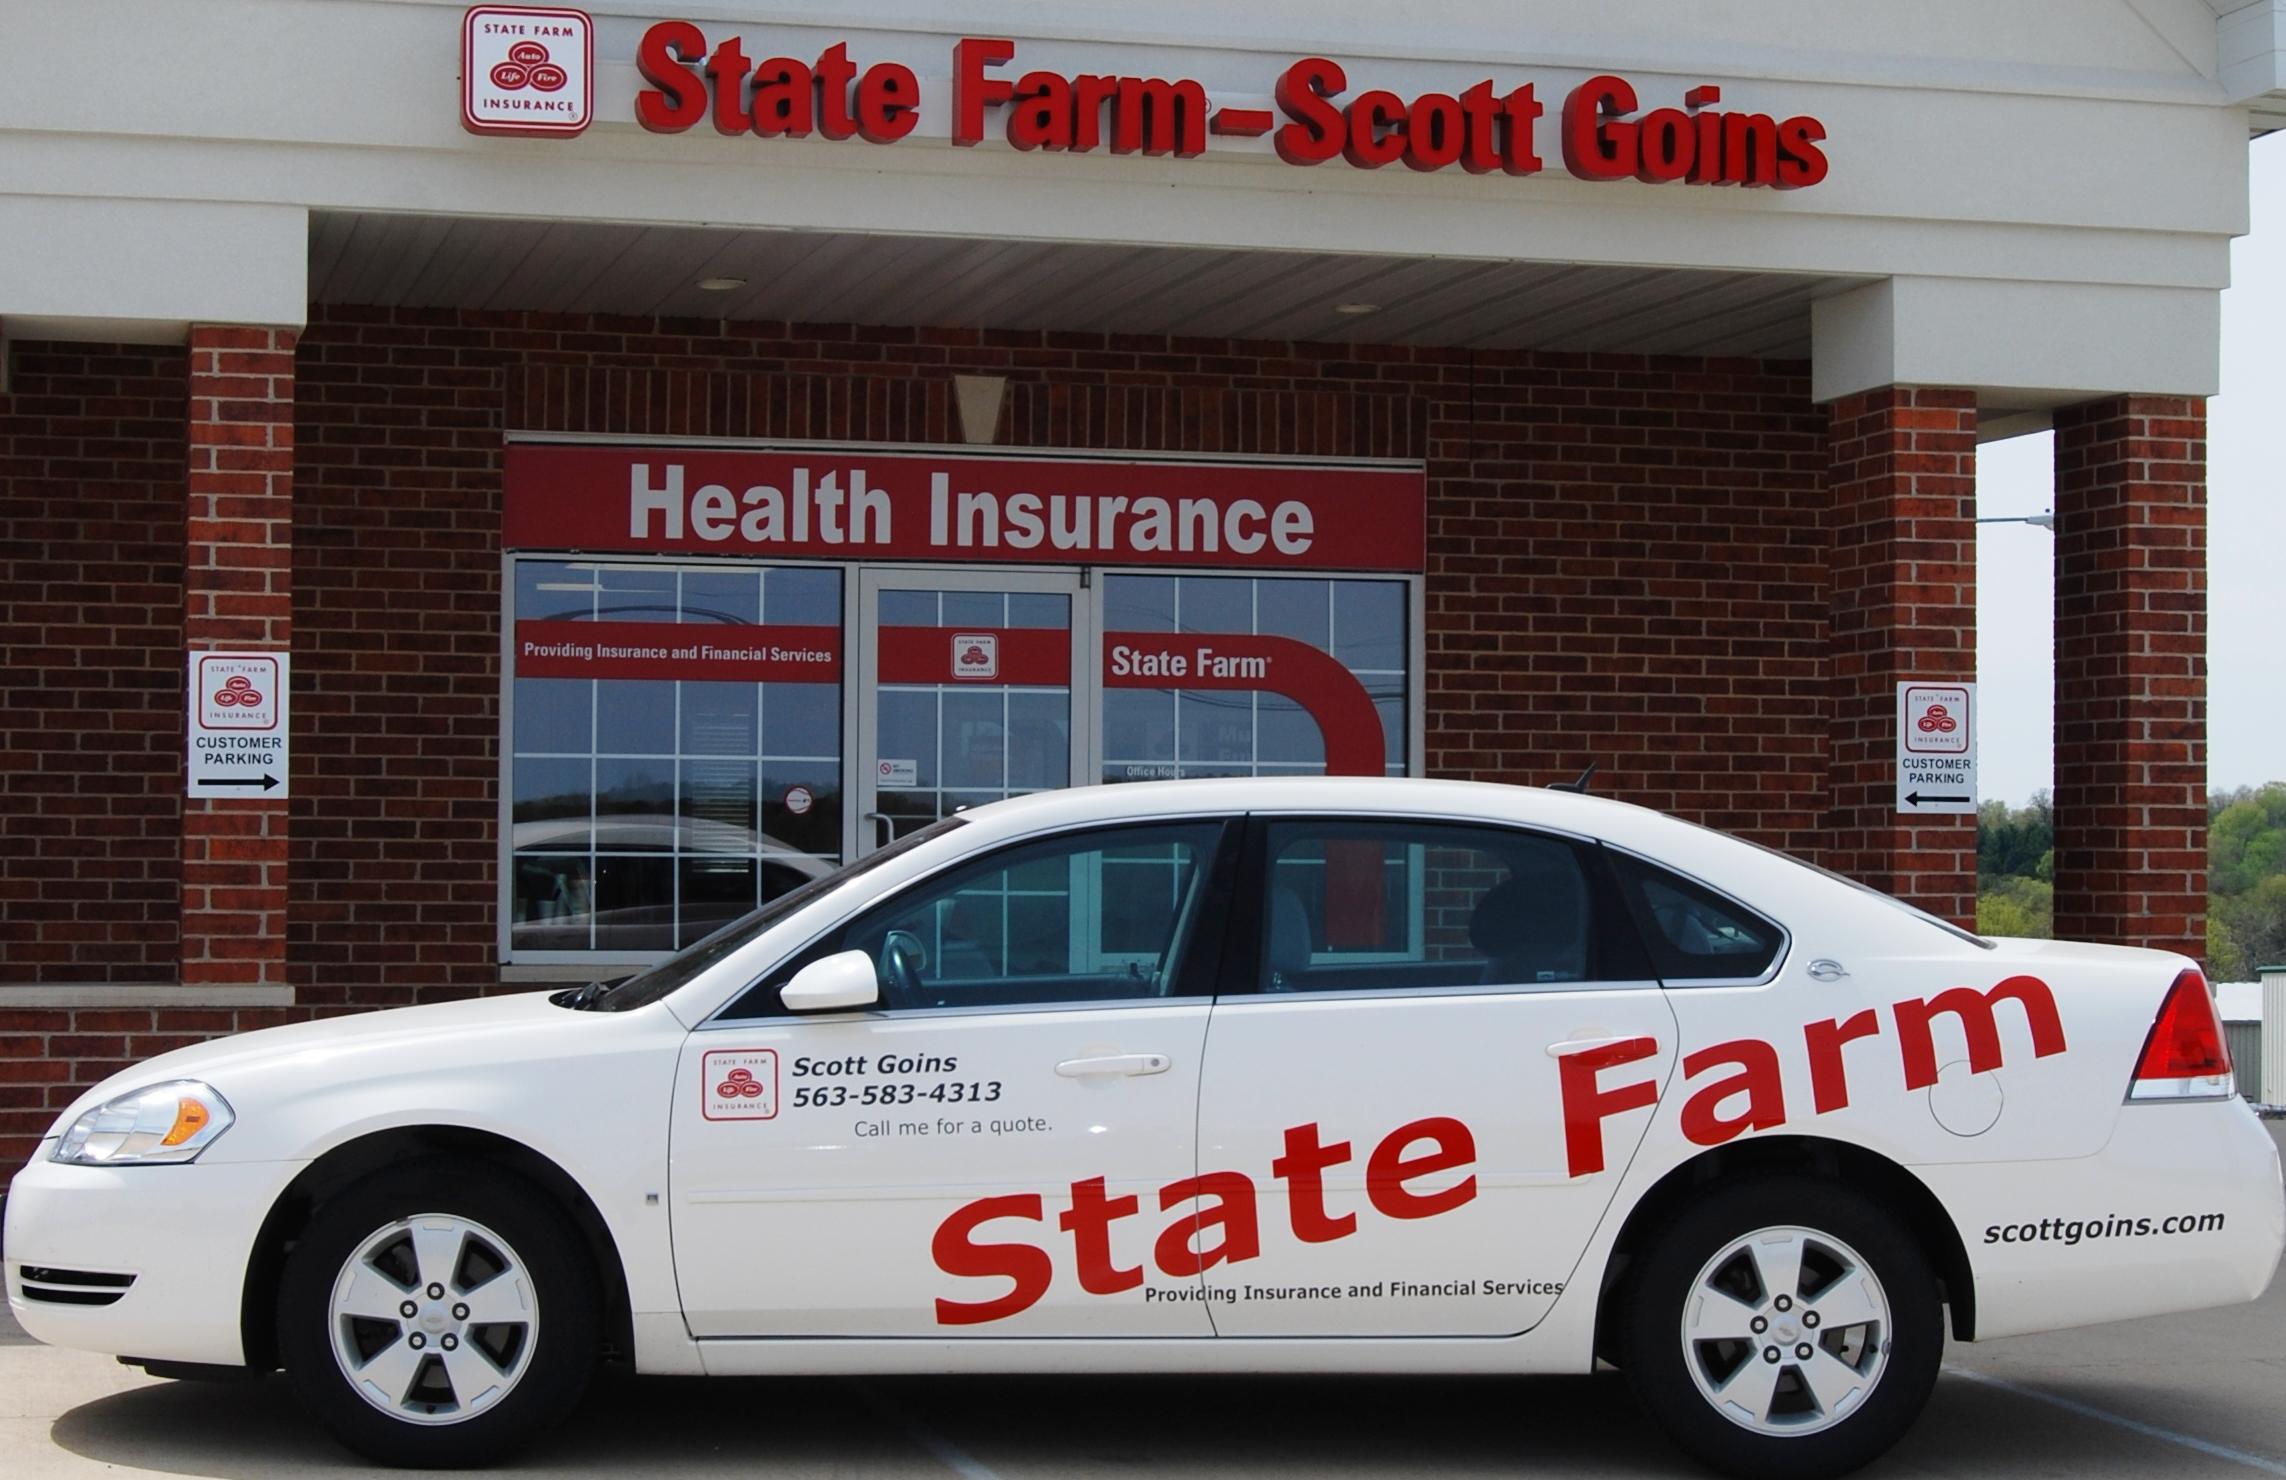 State Farm Quote Car Scott Goins  State Farm Agent